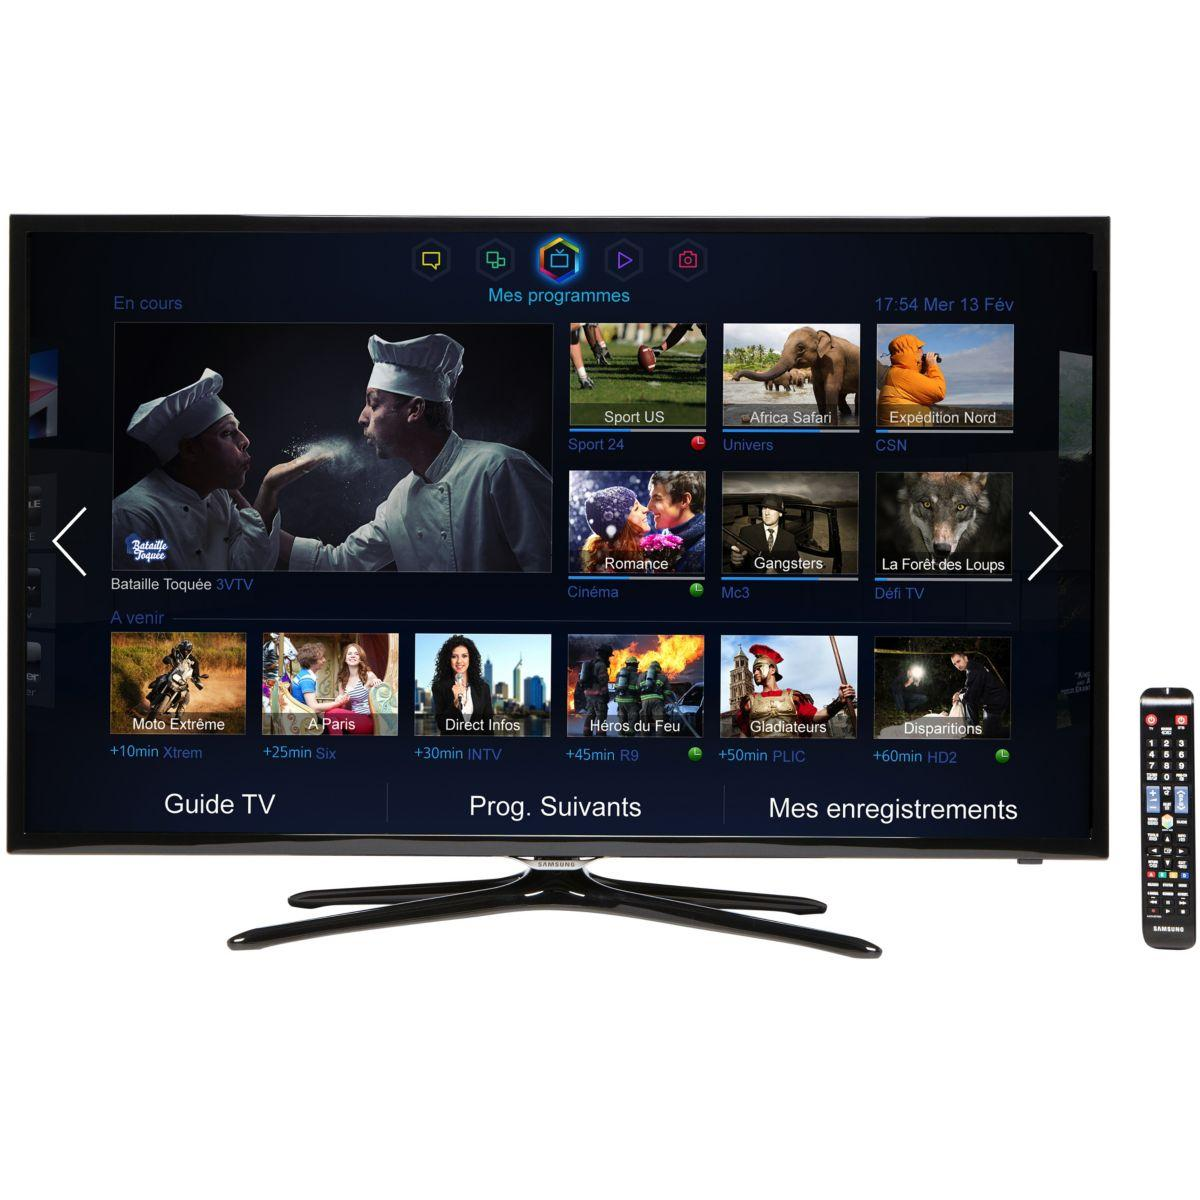 SMART TV Samsung LCD Full HD 1080p 107 cm UE42F5500